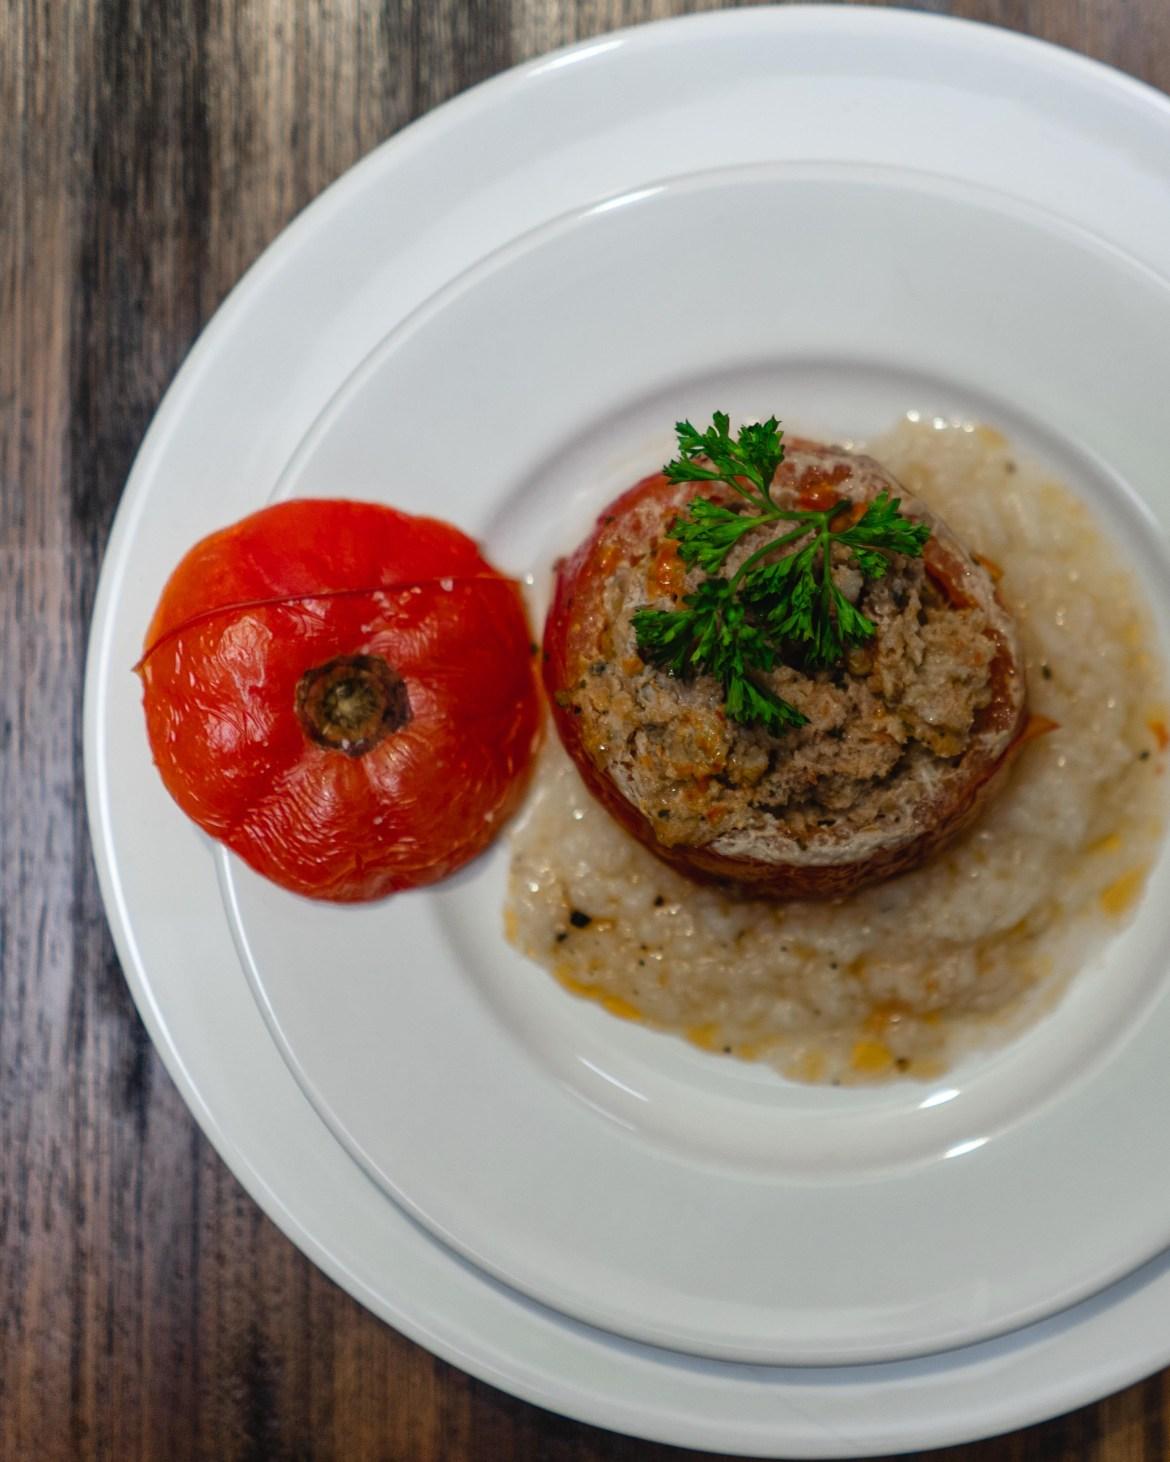 Stuffed Tomato Recipe